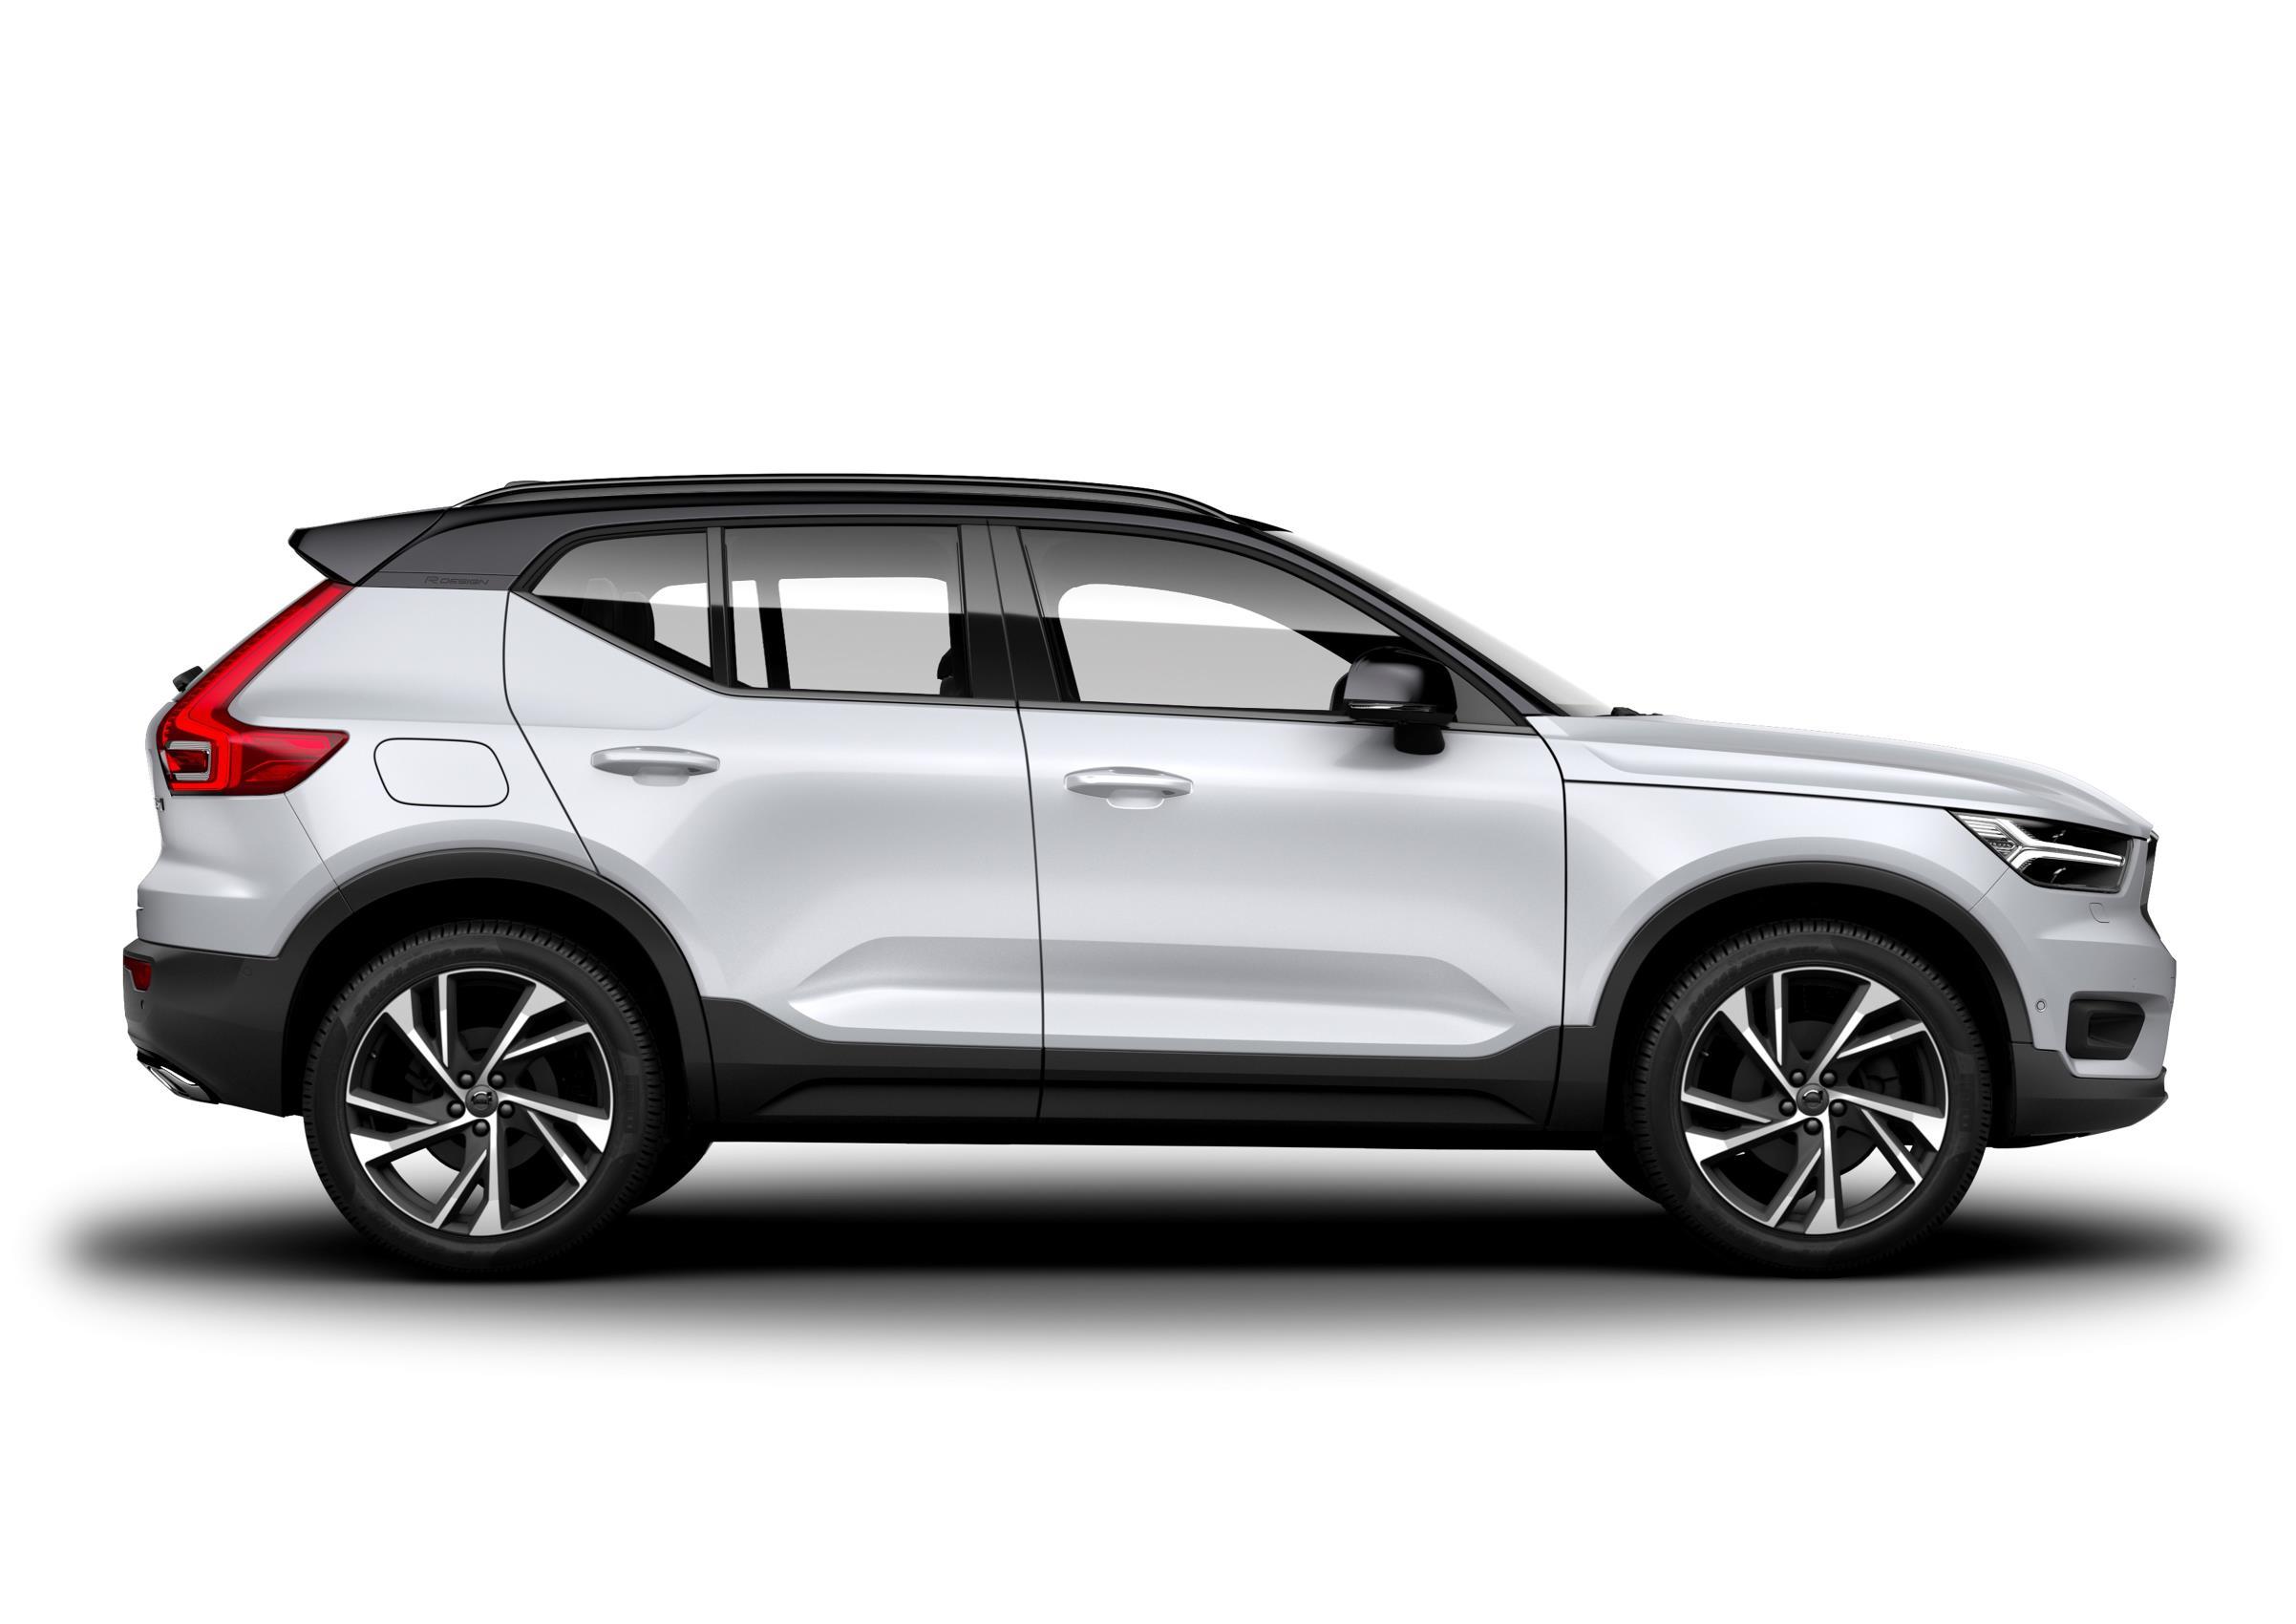 exterior new lease nj suv compact autonews myautoworld volvo com deals